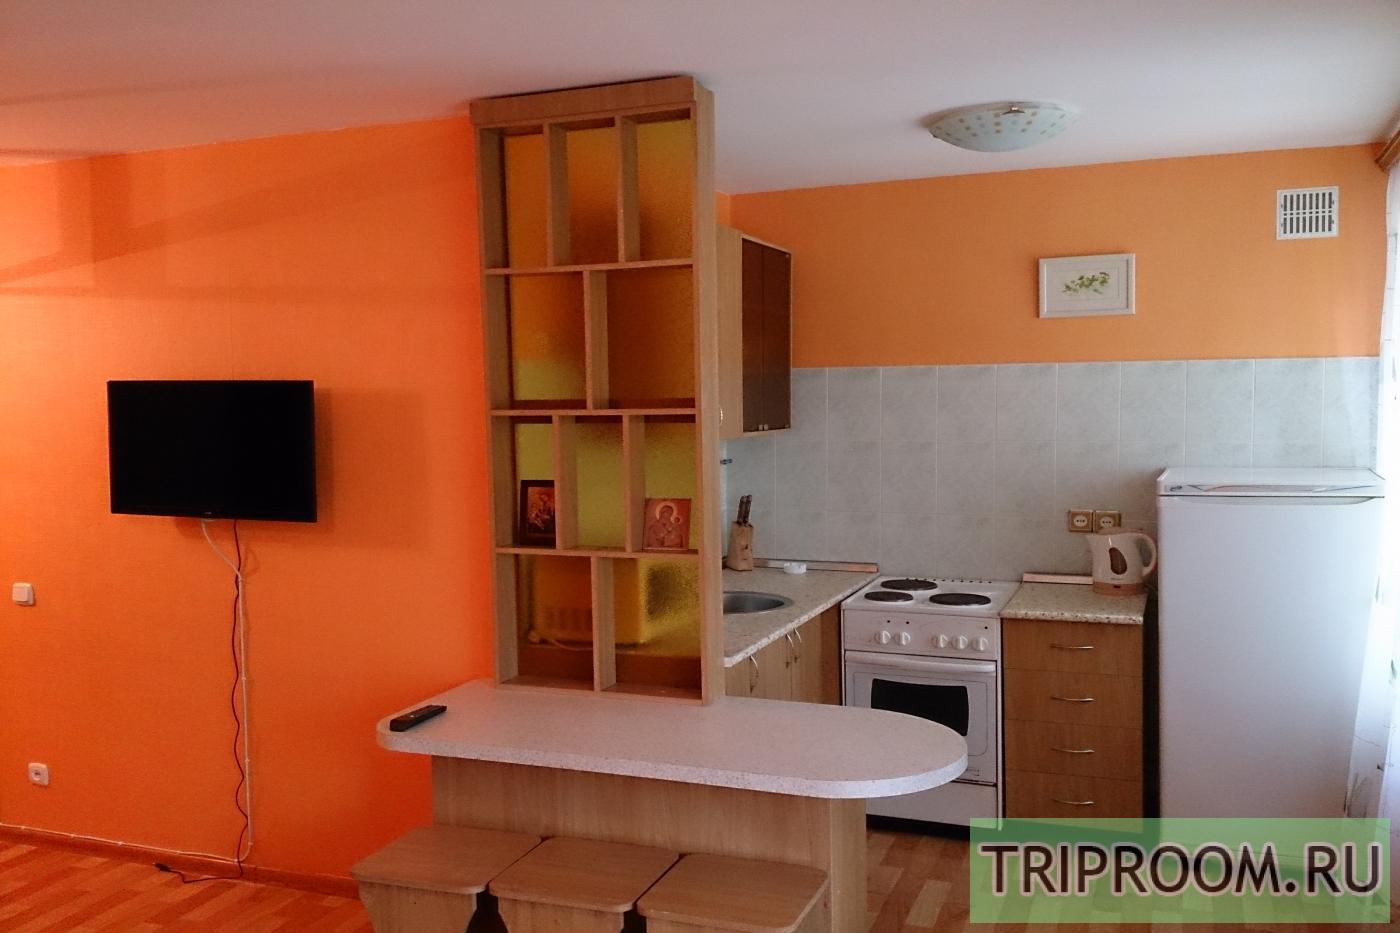 1-комнатная квартира посуточно (вариант № 12826), ул. Челюскинцев улица, фото № 3